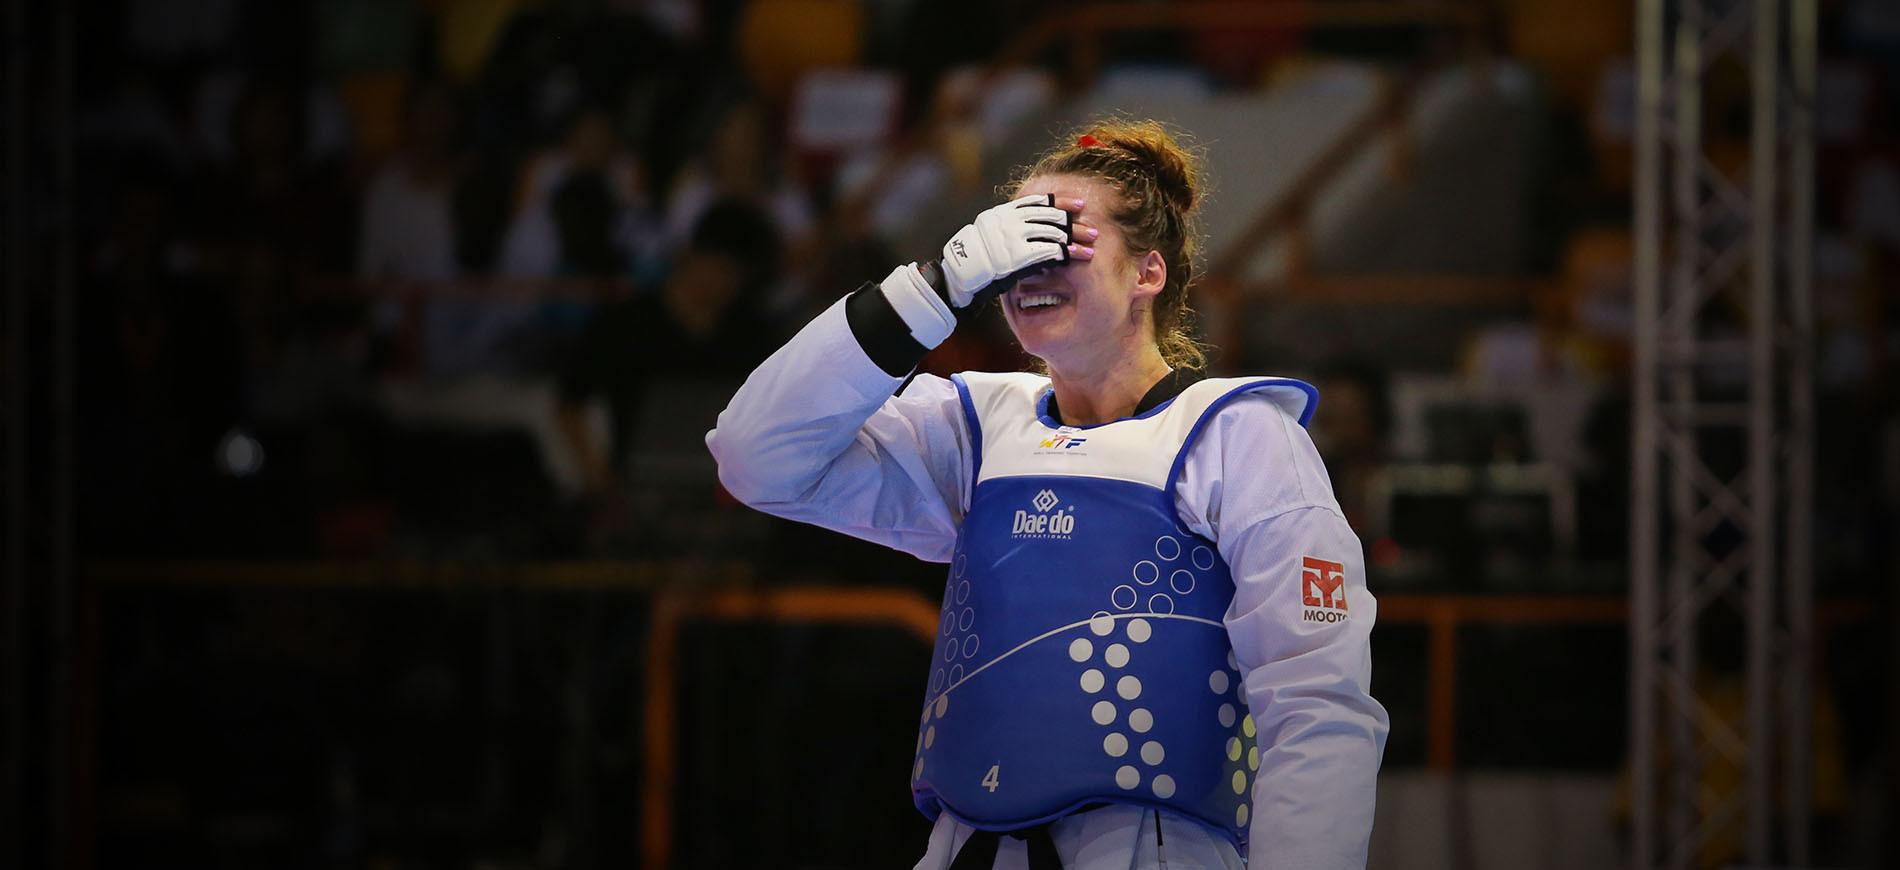 Bianca Walkden capped a brilliant season with victory ©World Taekwondo